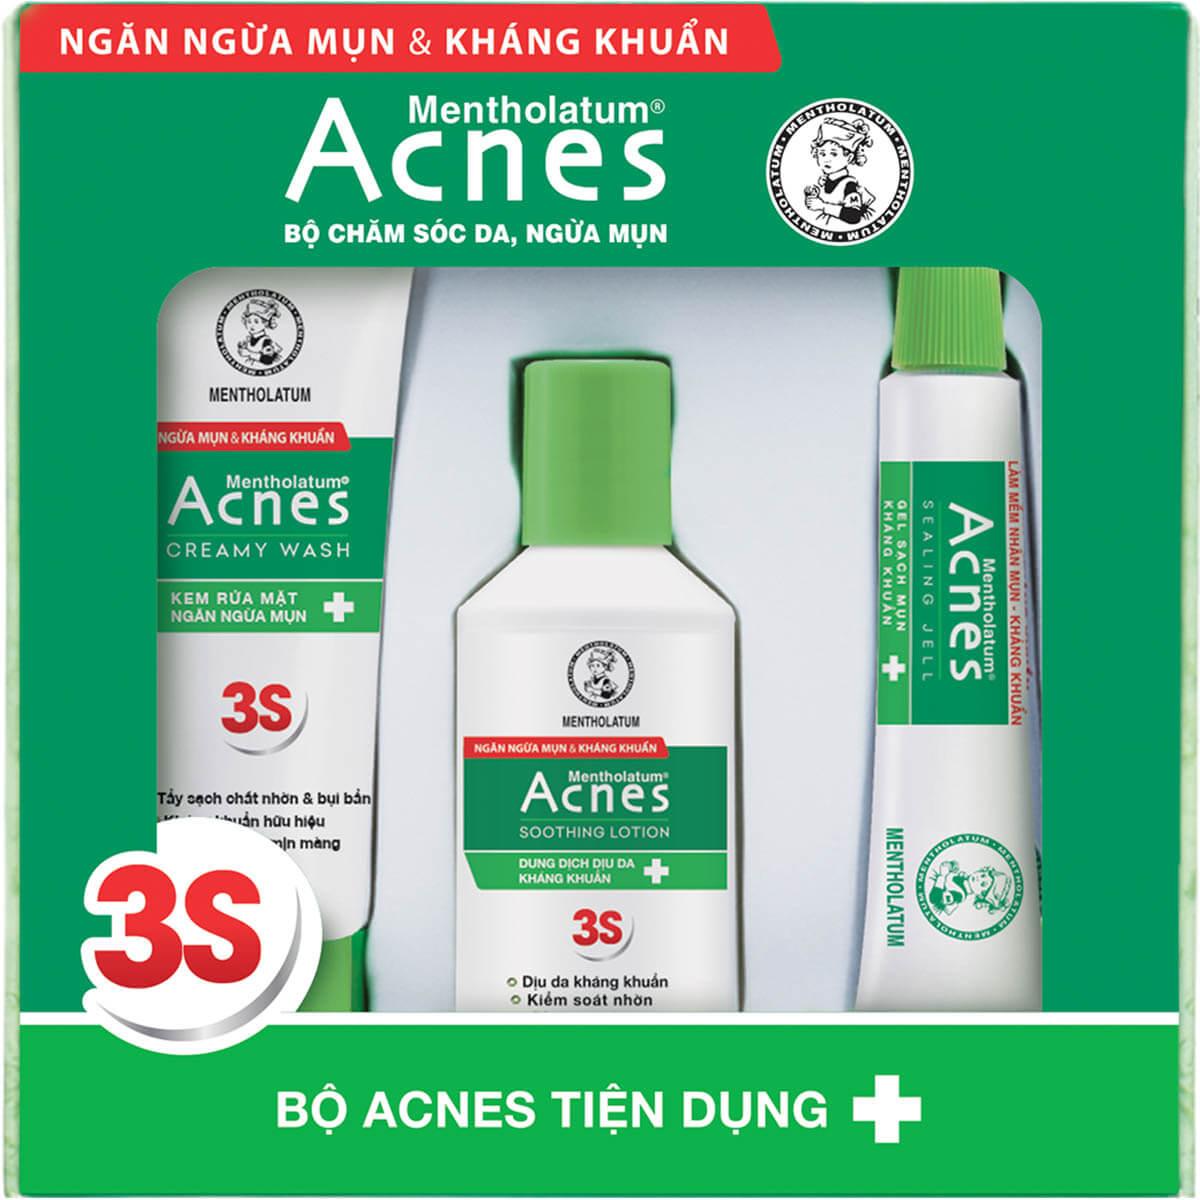 Acnes Sealing Jell trị mụn hiệu quả